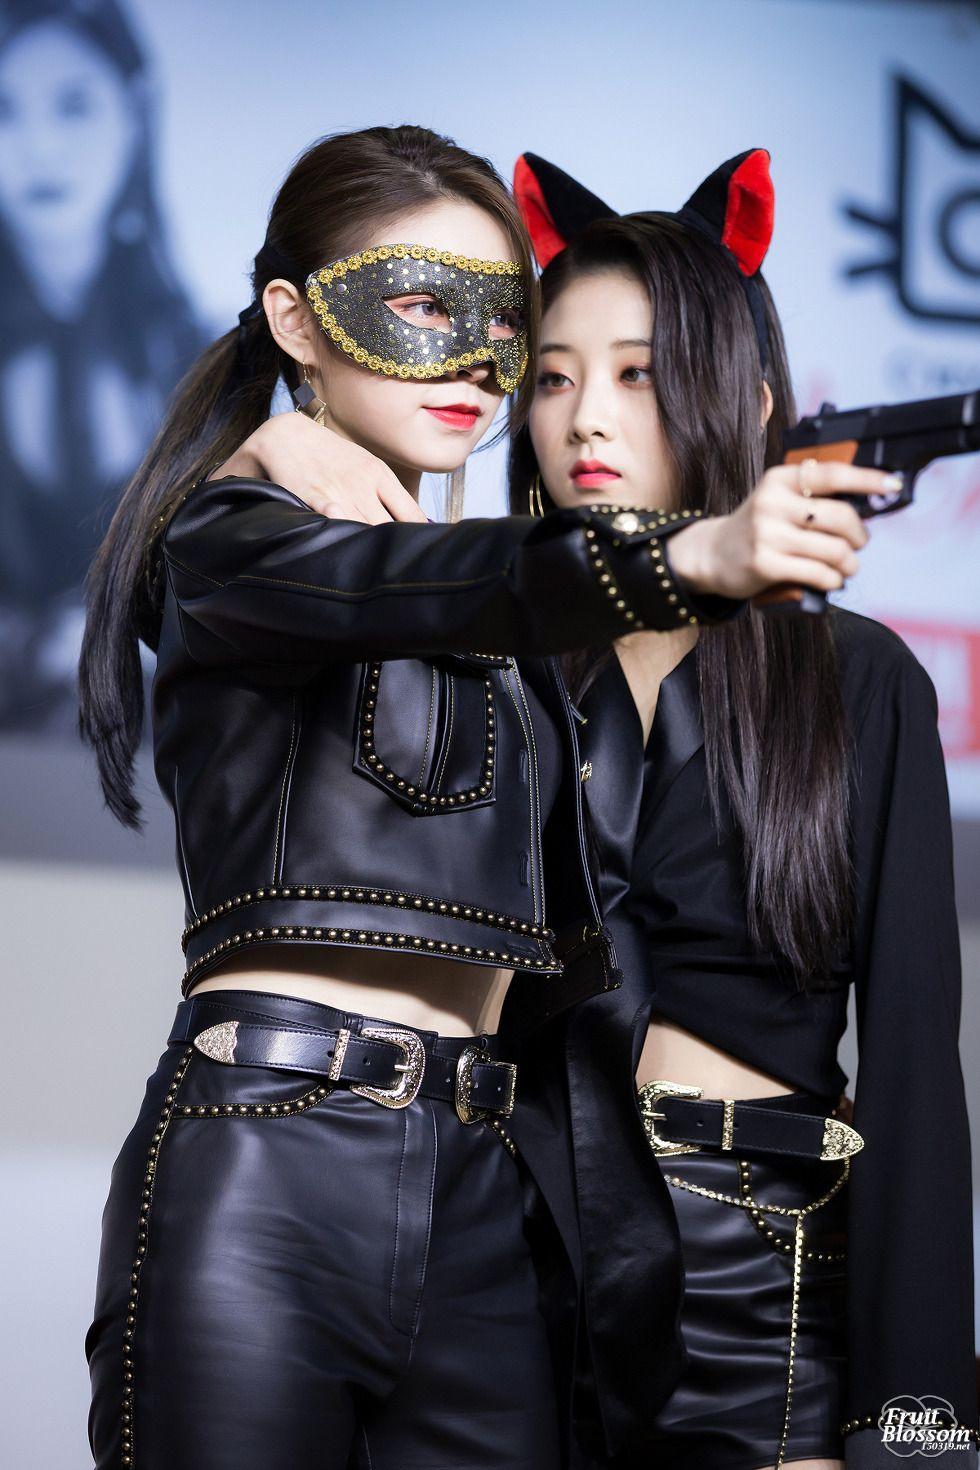 Dedicated To Female Kpop Idols Kpop Girls Clc These Girls